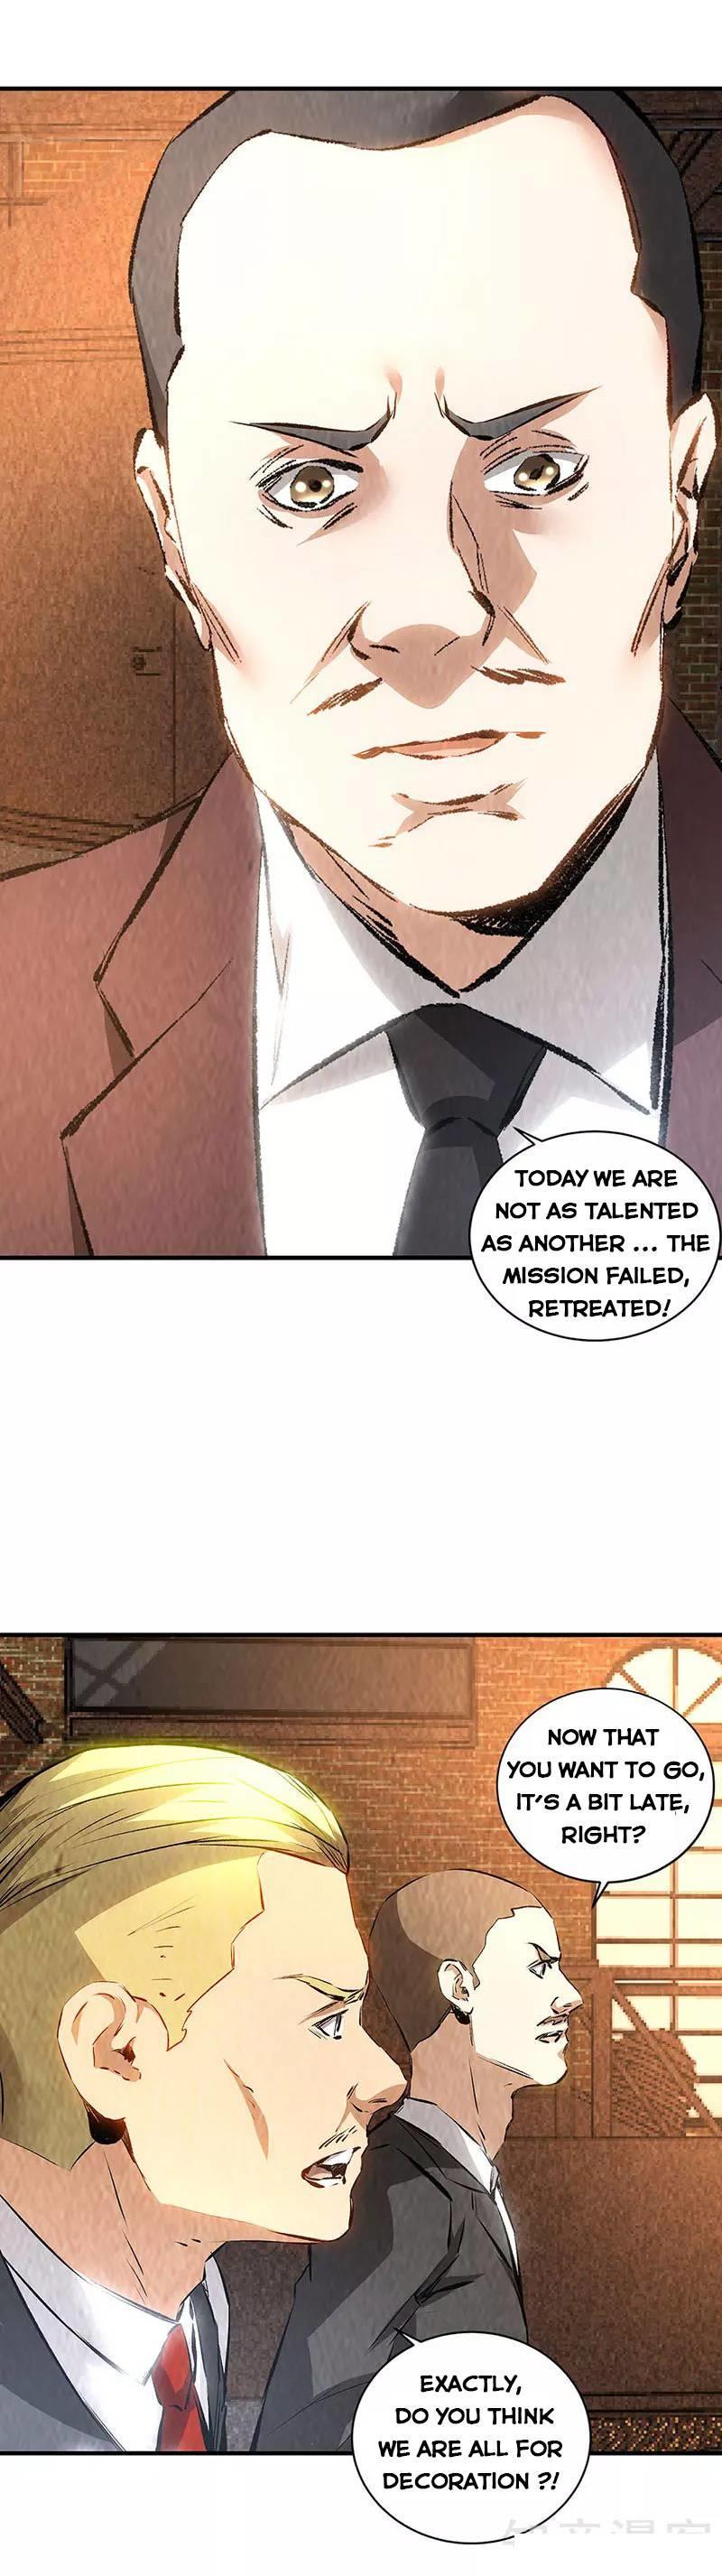 I Was Trash Chapter 216 page 10 - Mangakakalot